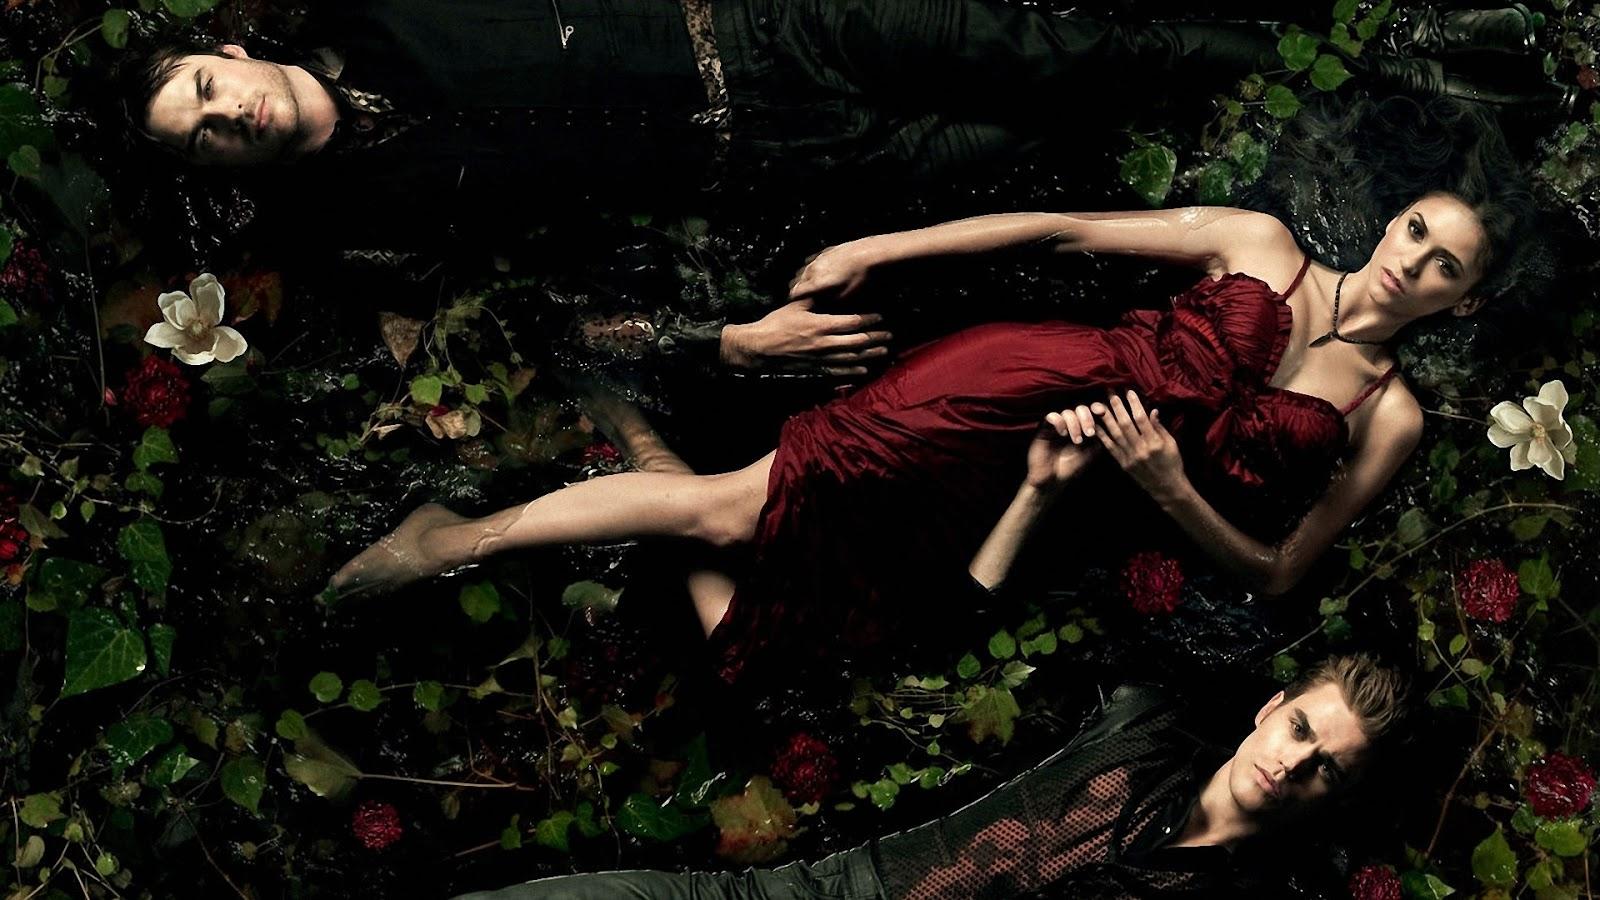 http://1.bp.blogspot.com/-qm87ycndI1A/UV5UYUUhJLI/AAAAAAAAGt8/SrOKWXjrSn4/s1600/the_vampire_diaries_season_3-HD.jpg